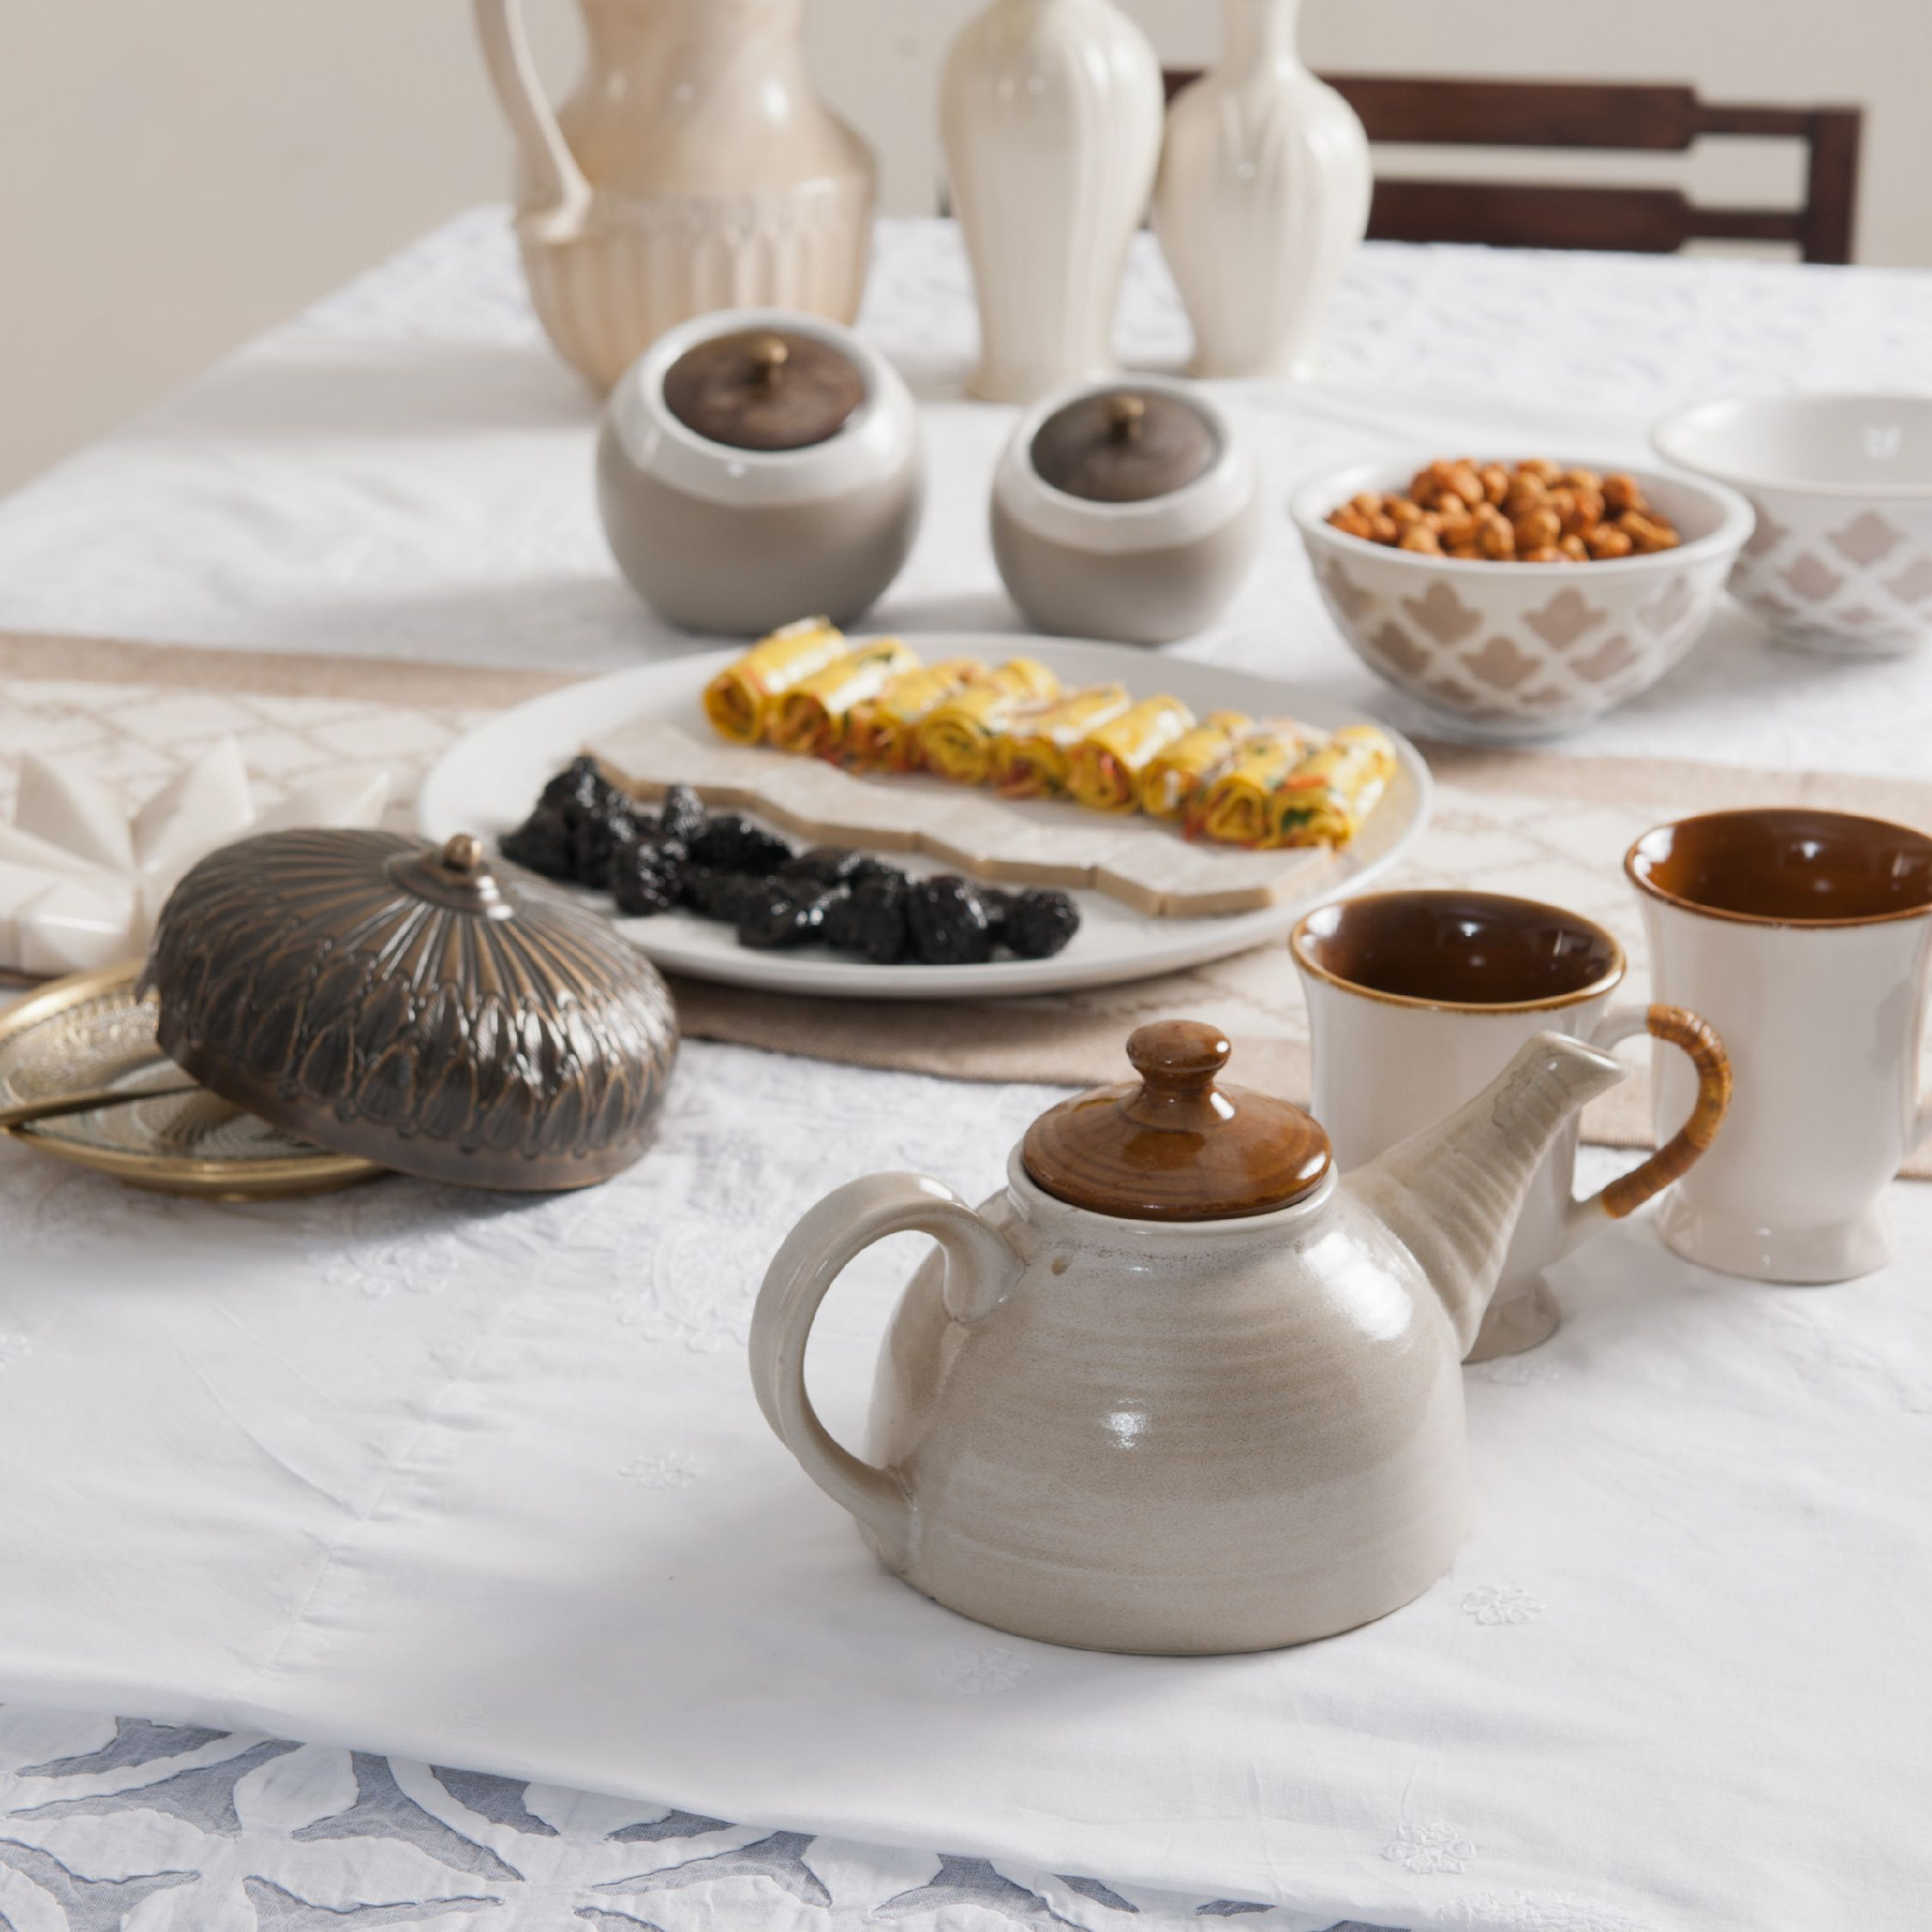 #tableware #ceramics #tea-set #mugs #bowls #platter #table